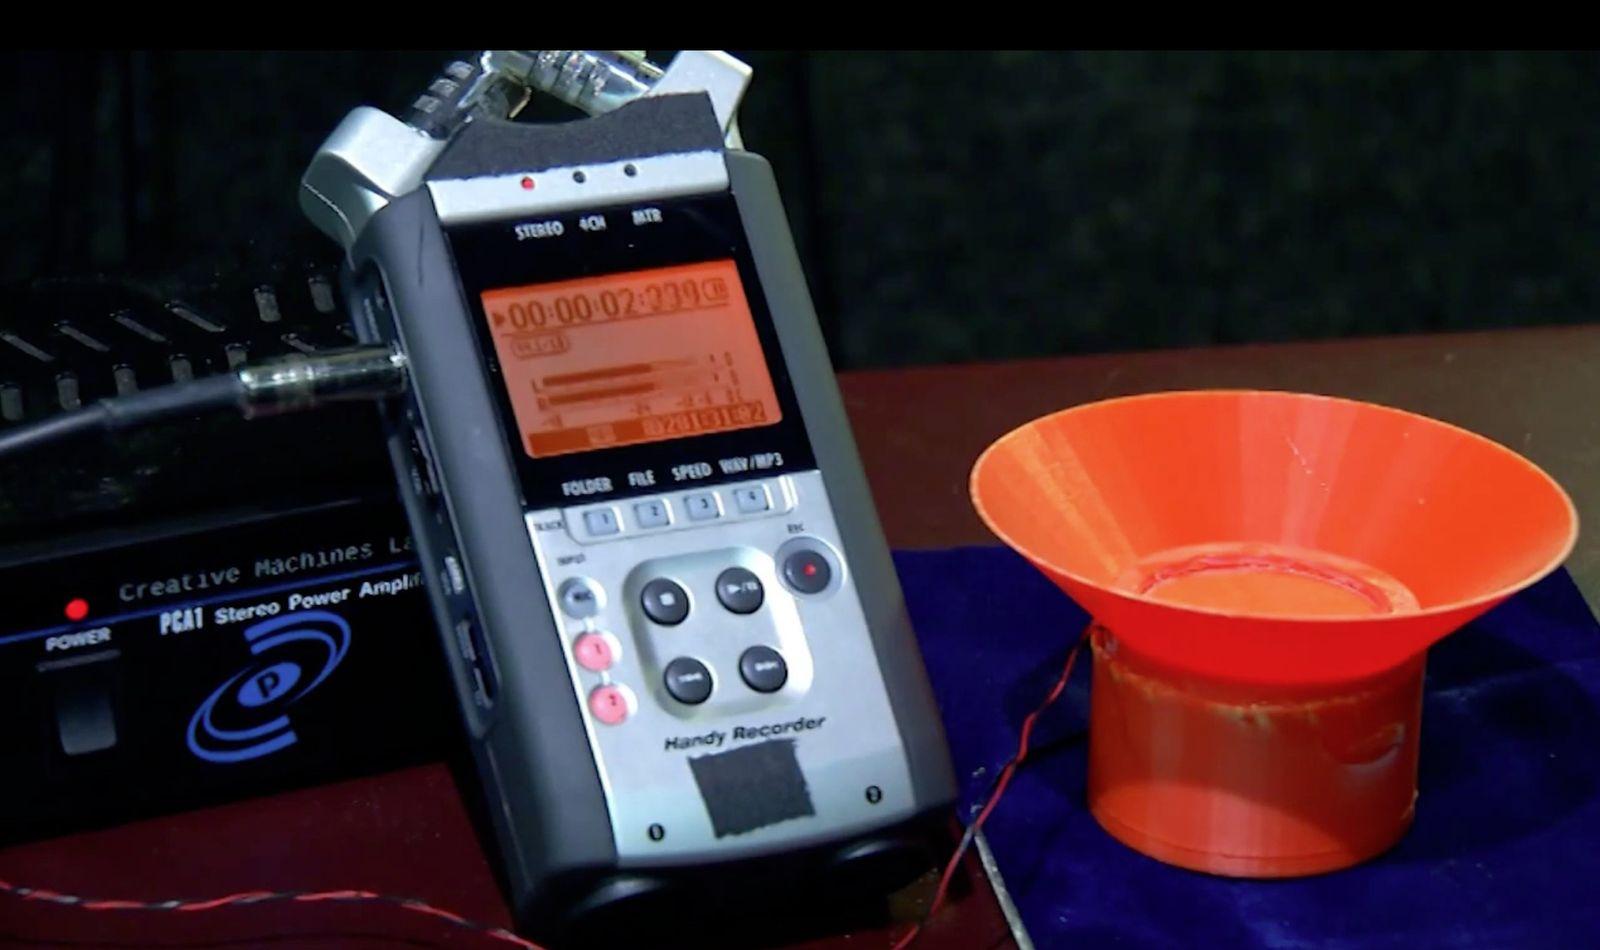 NUR ALS ZITAT Screenshot 3-D-Drucker Lautsprecher Cornell